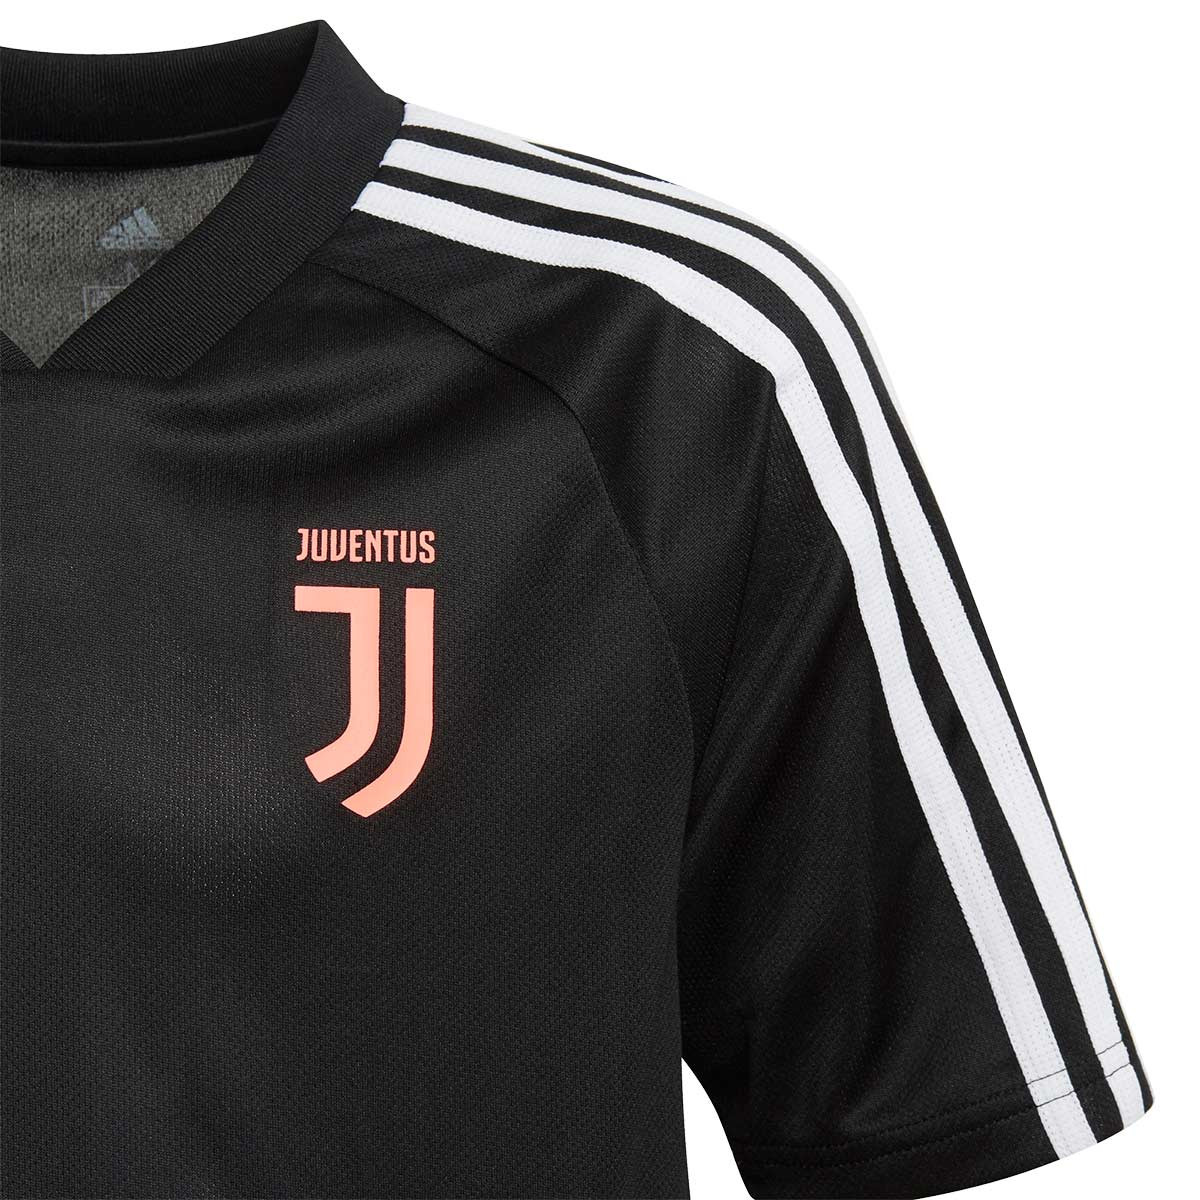 various colors 5519a 7558c Camiseta Juventus Training 2019-2020 Niño Black-Dark grey